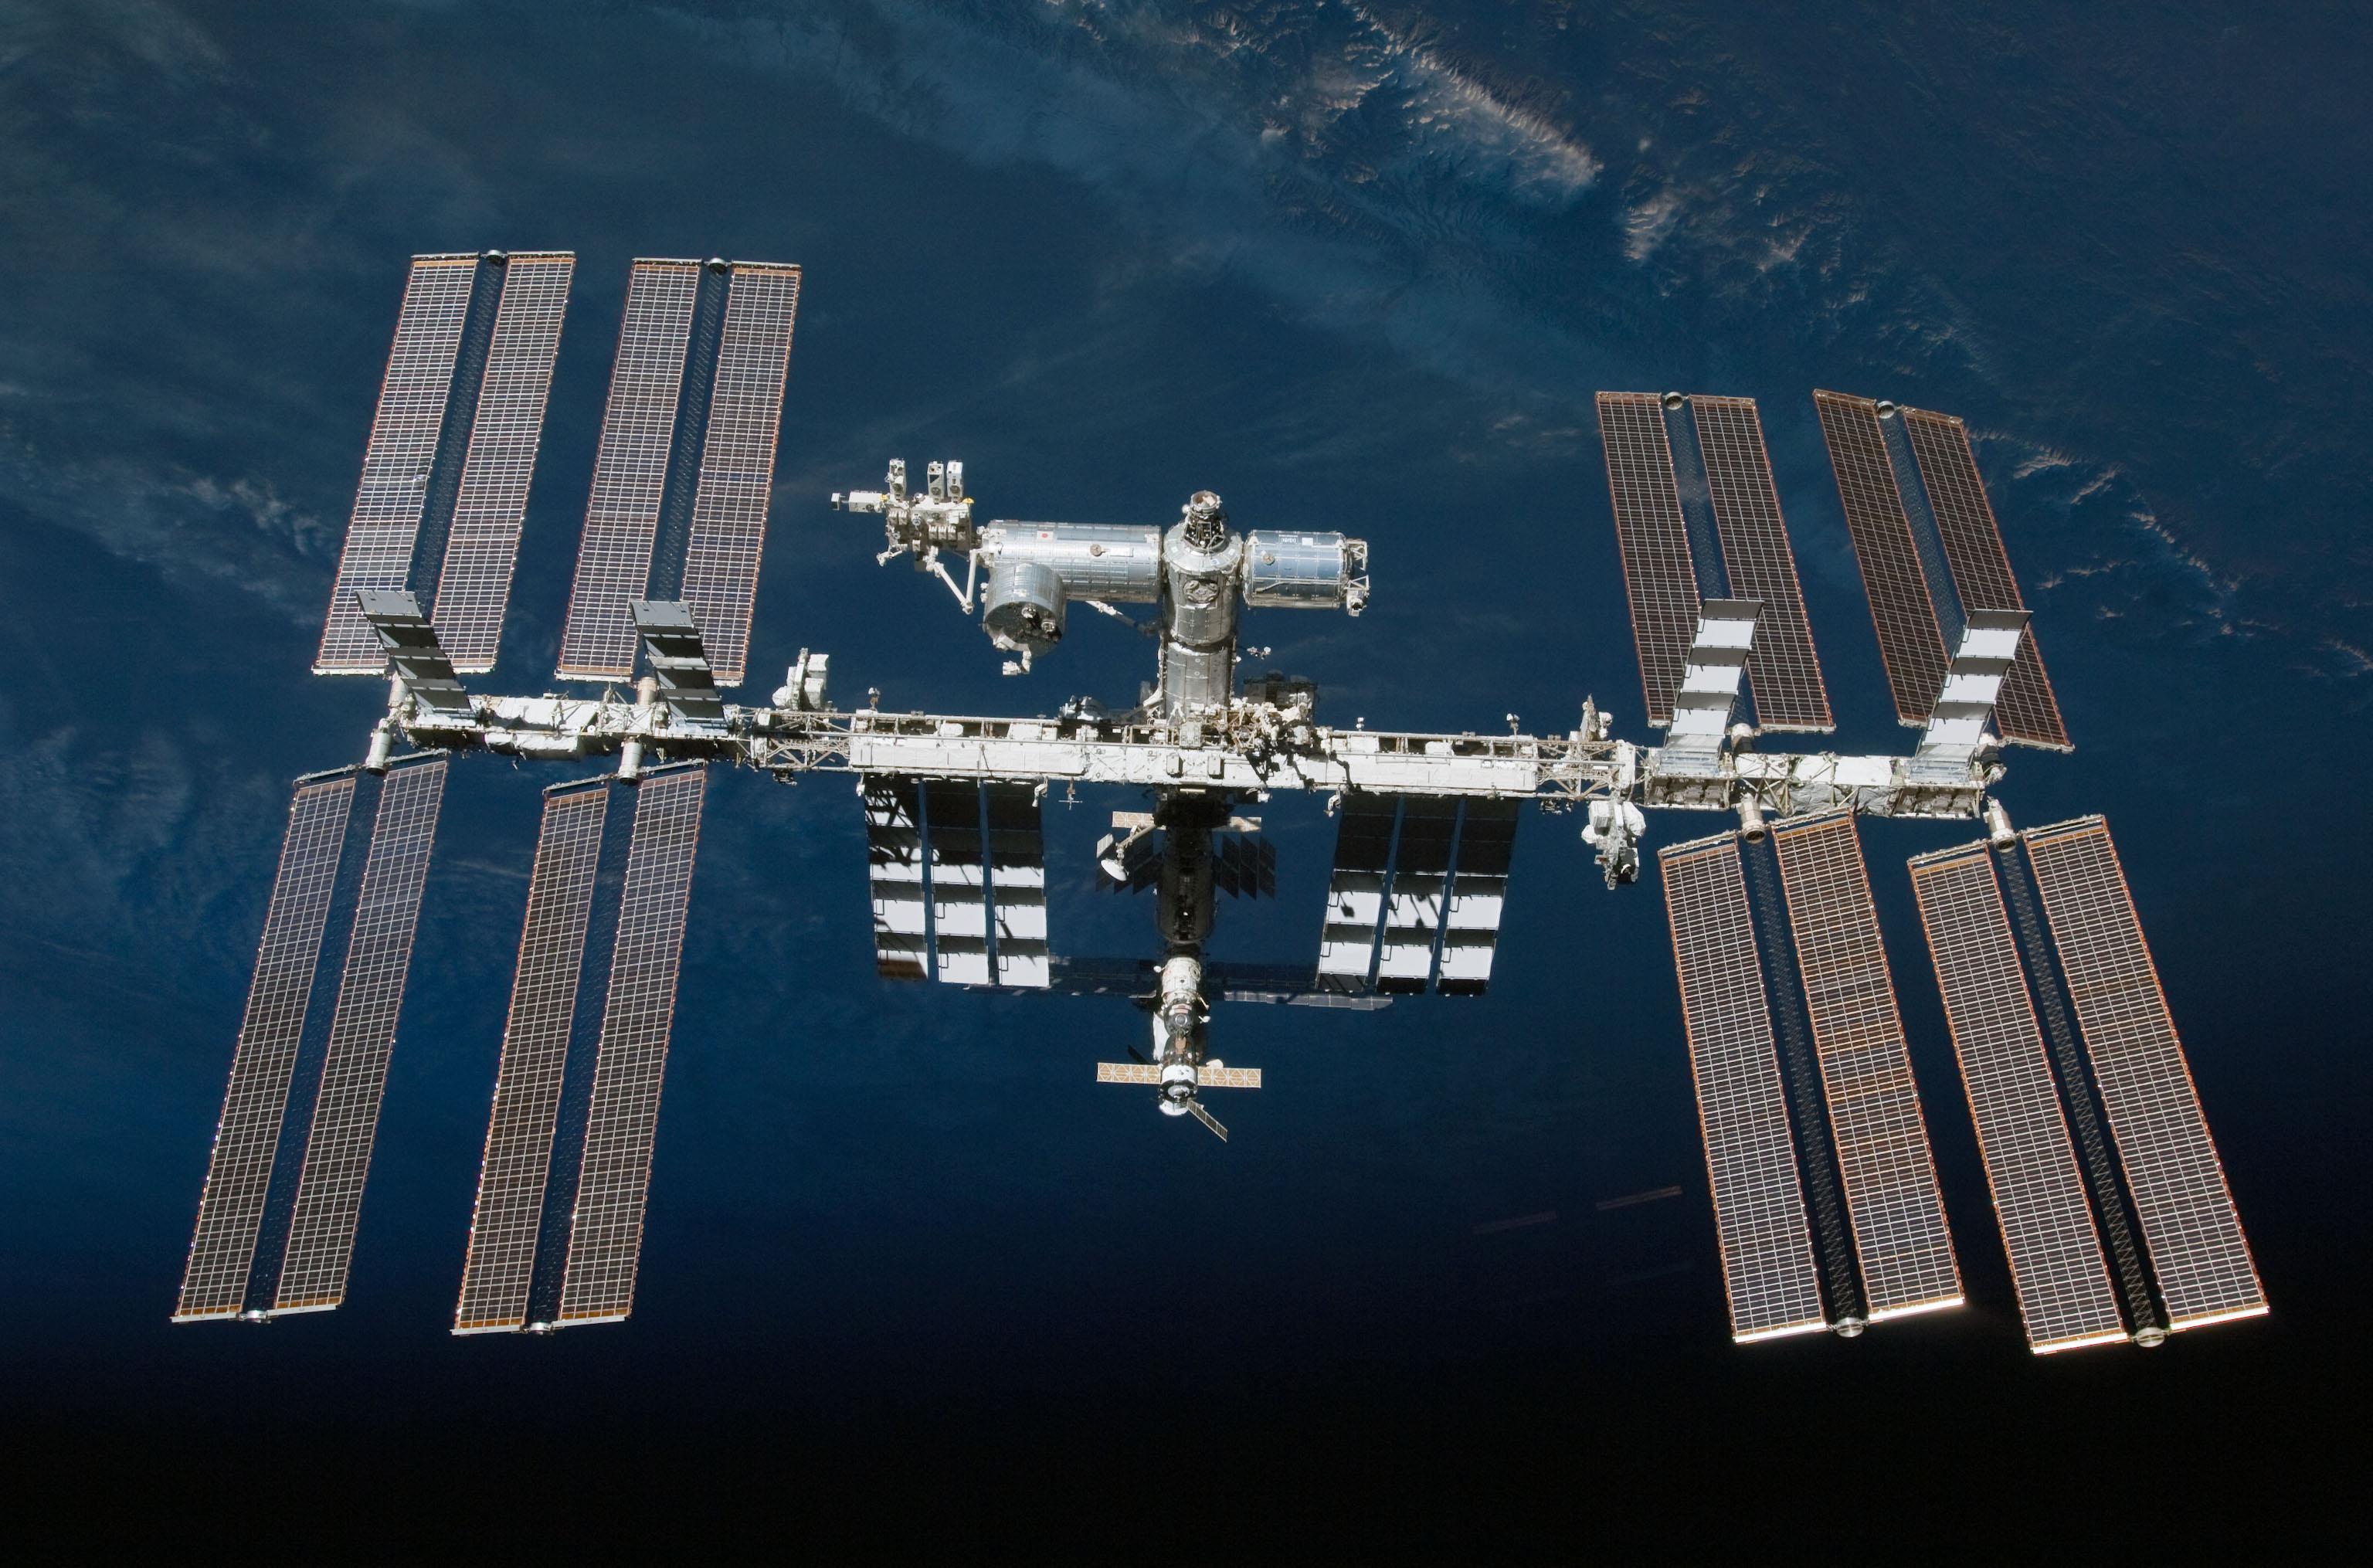 nasa international space station information - photo #1